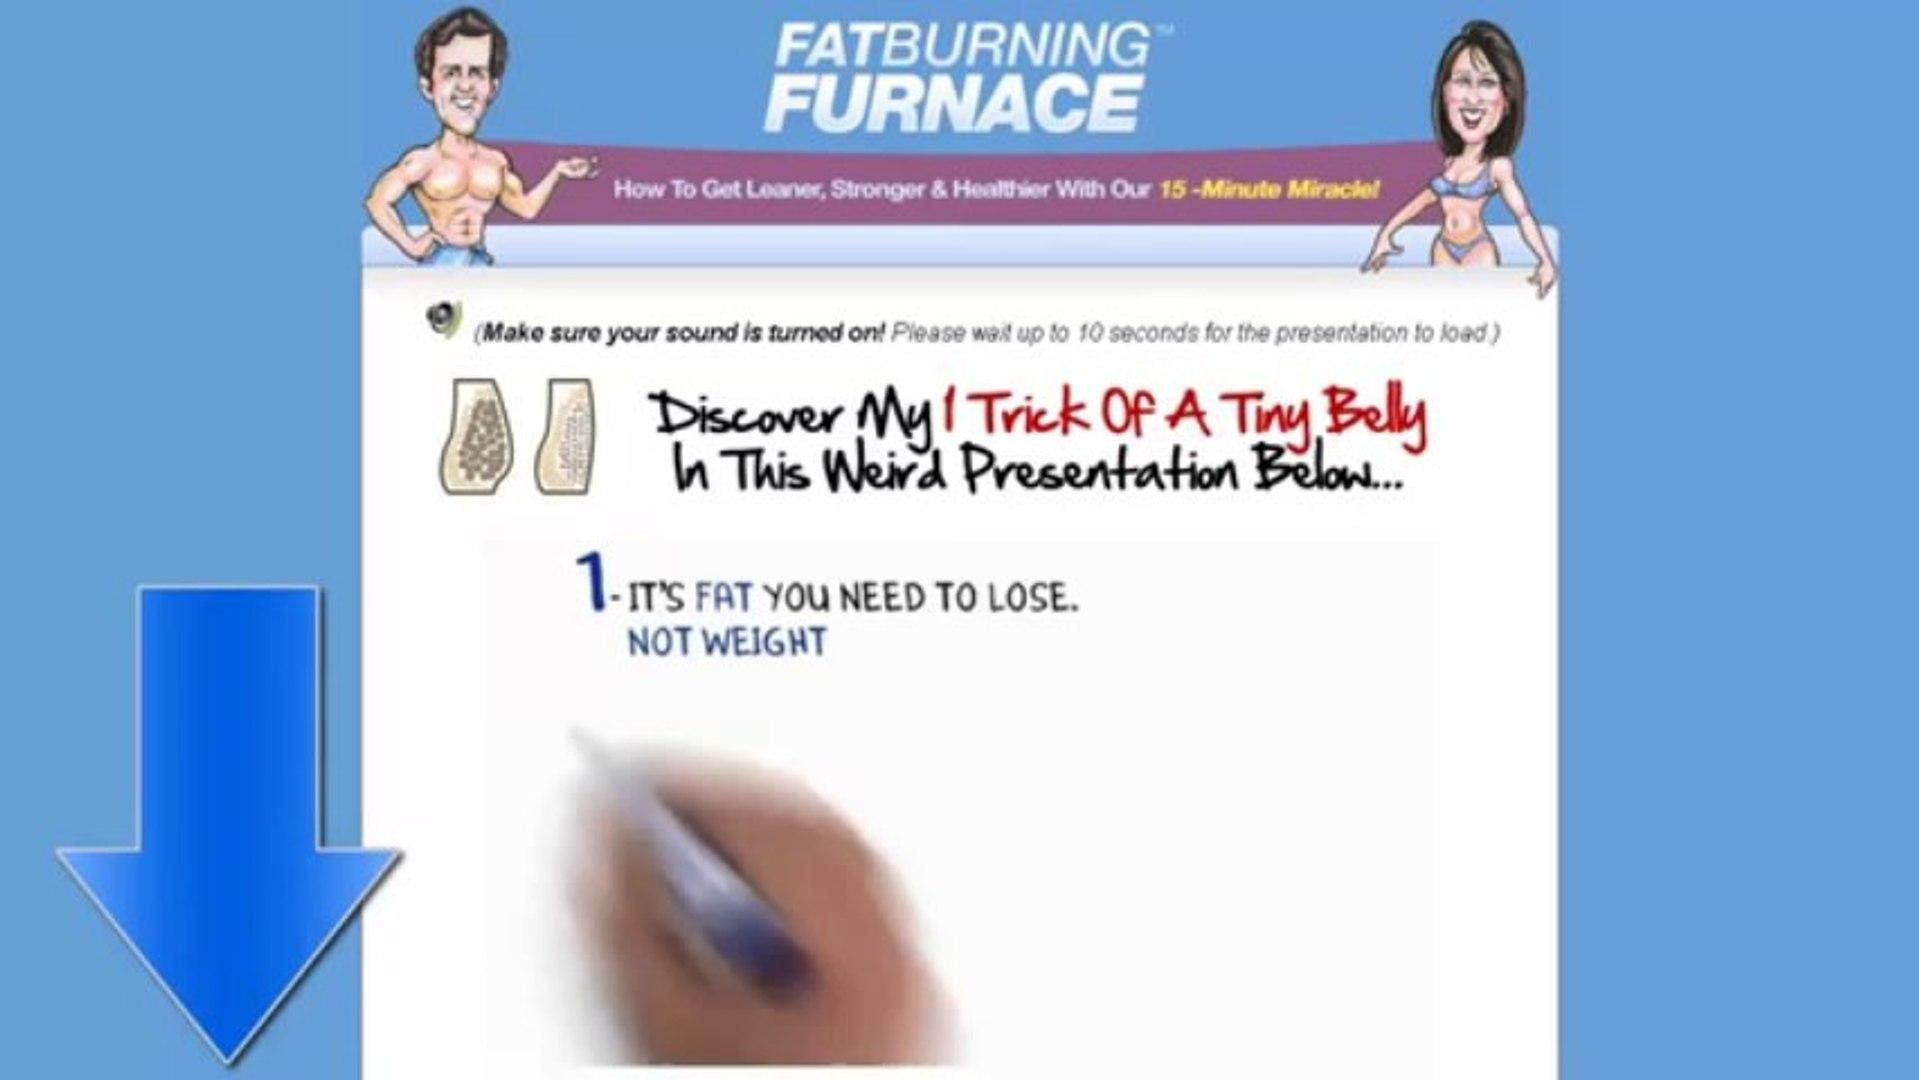 Fat Burning Furnace Review - Fat Burning Furnace User Scam Alert